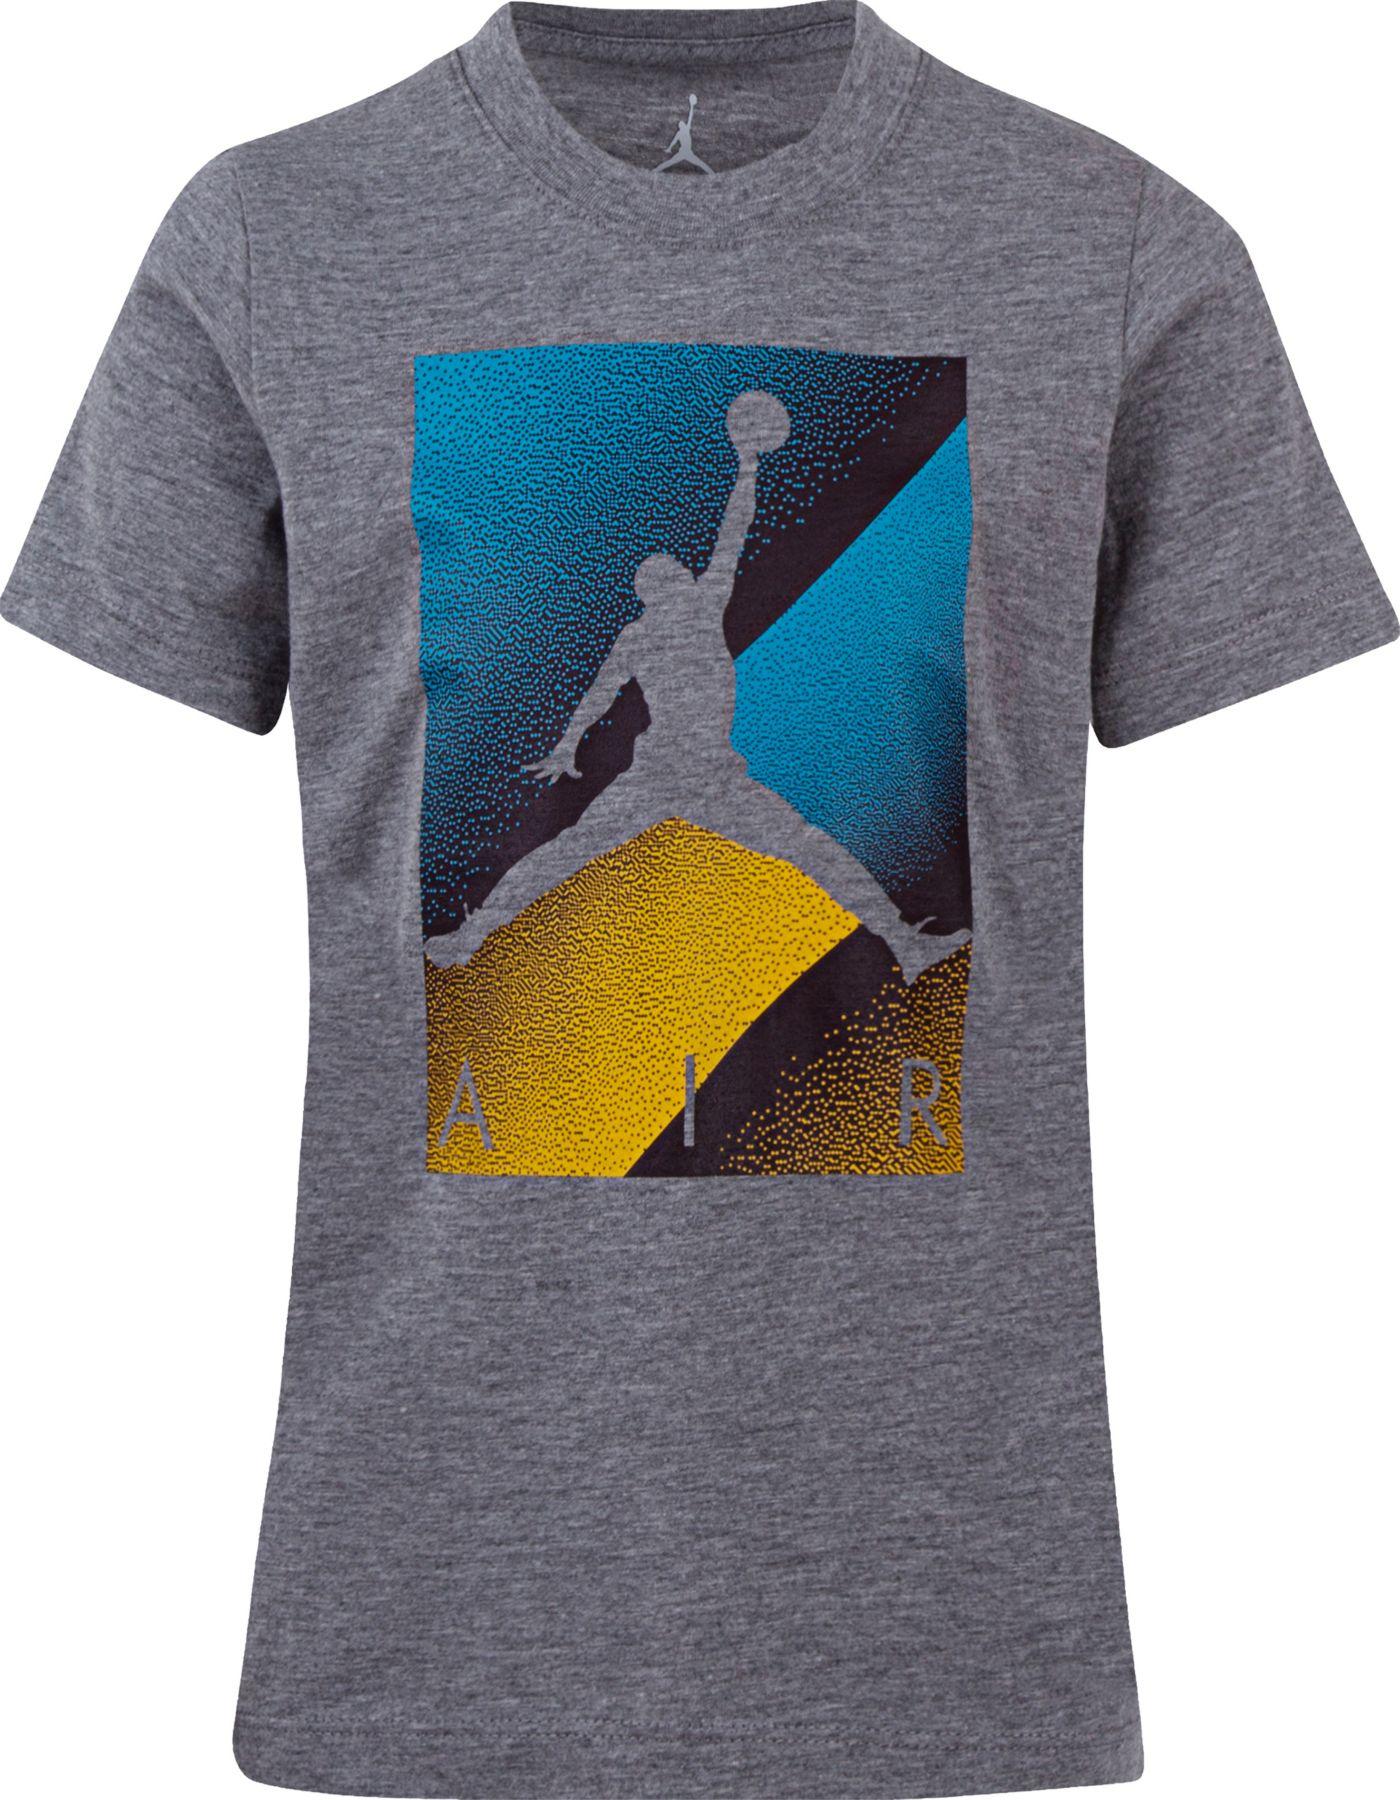 Jordan Boys' Air Colorblock Box Logo Graphic T-Shirt